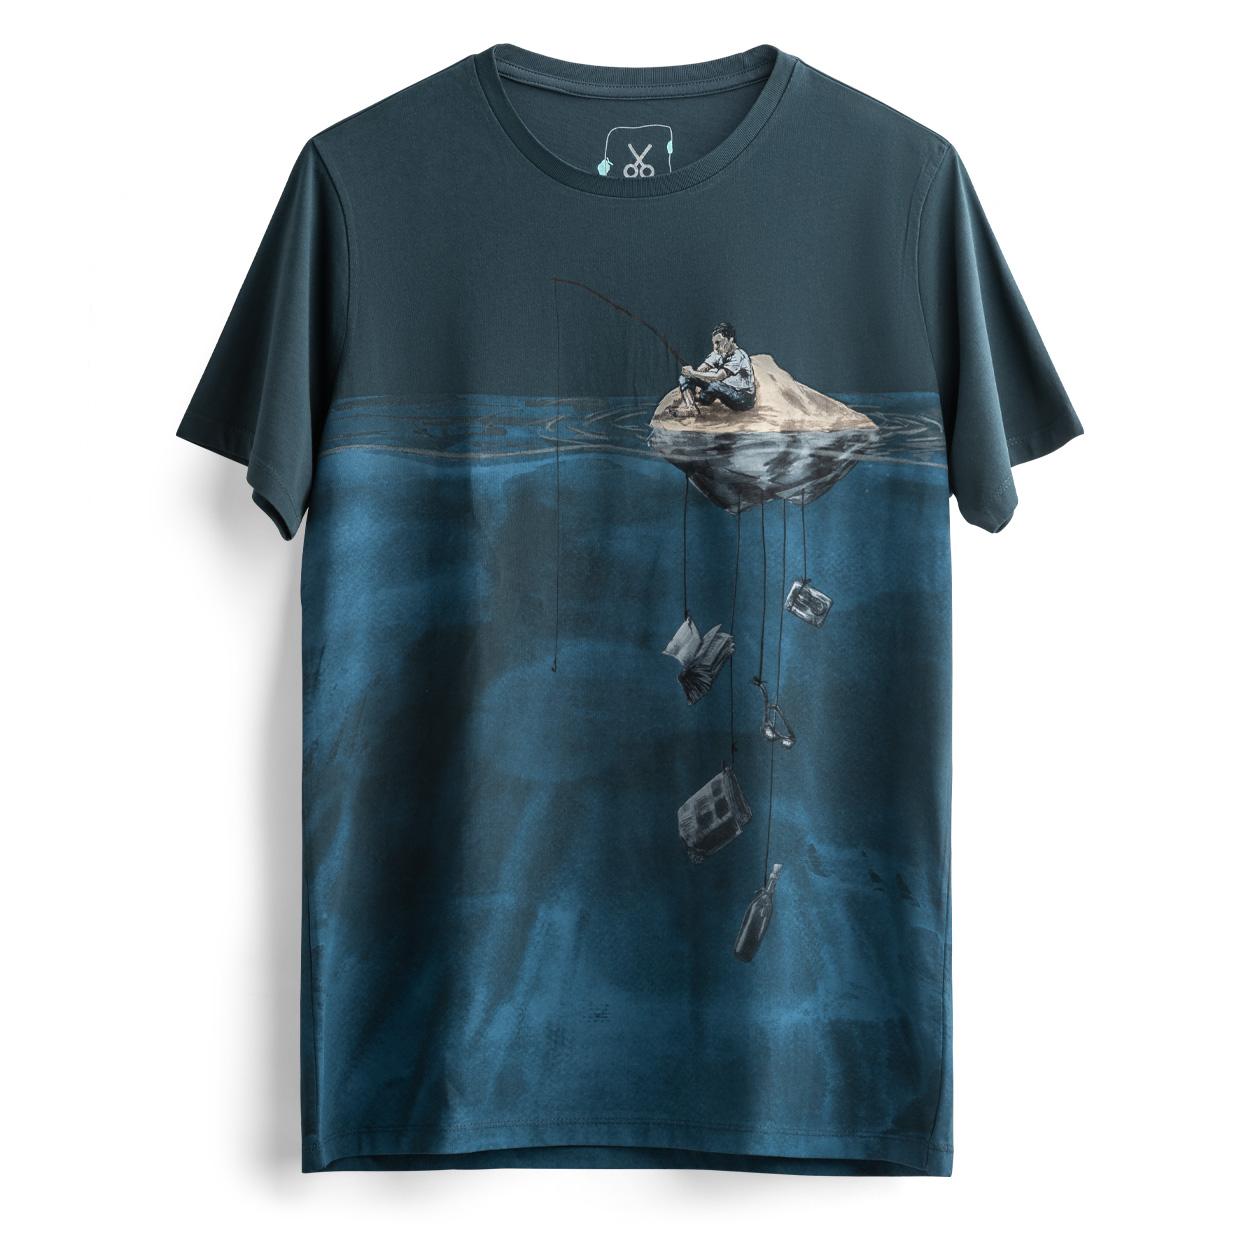 Textile Manufacture Company Tshirt- Hoody- Sweatshirt-Trackusuit